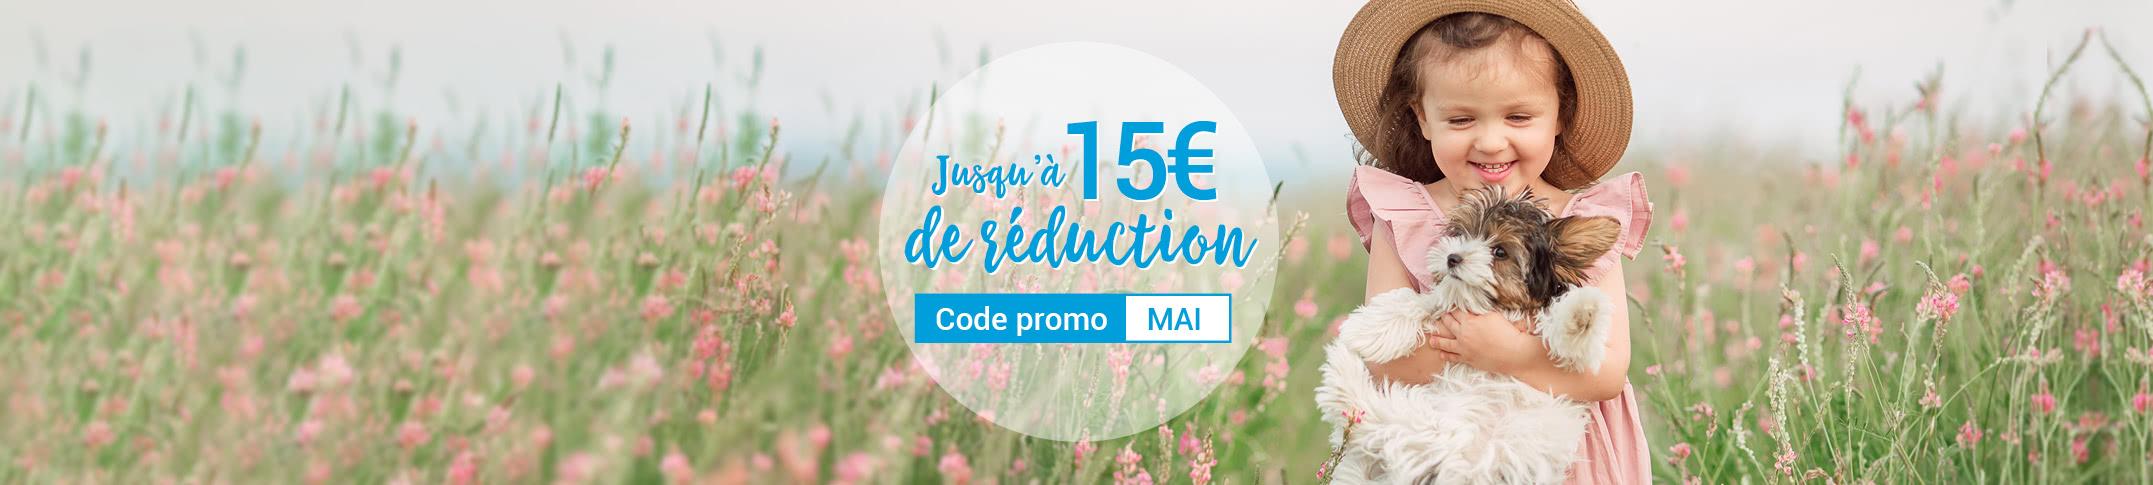 Code promo smartphoto.fr mai 2021